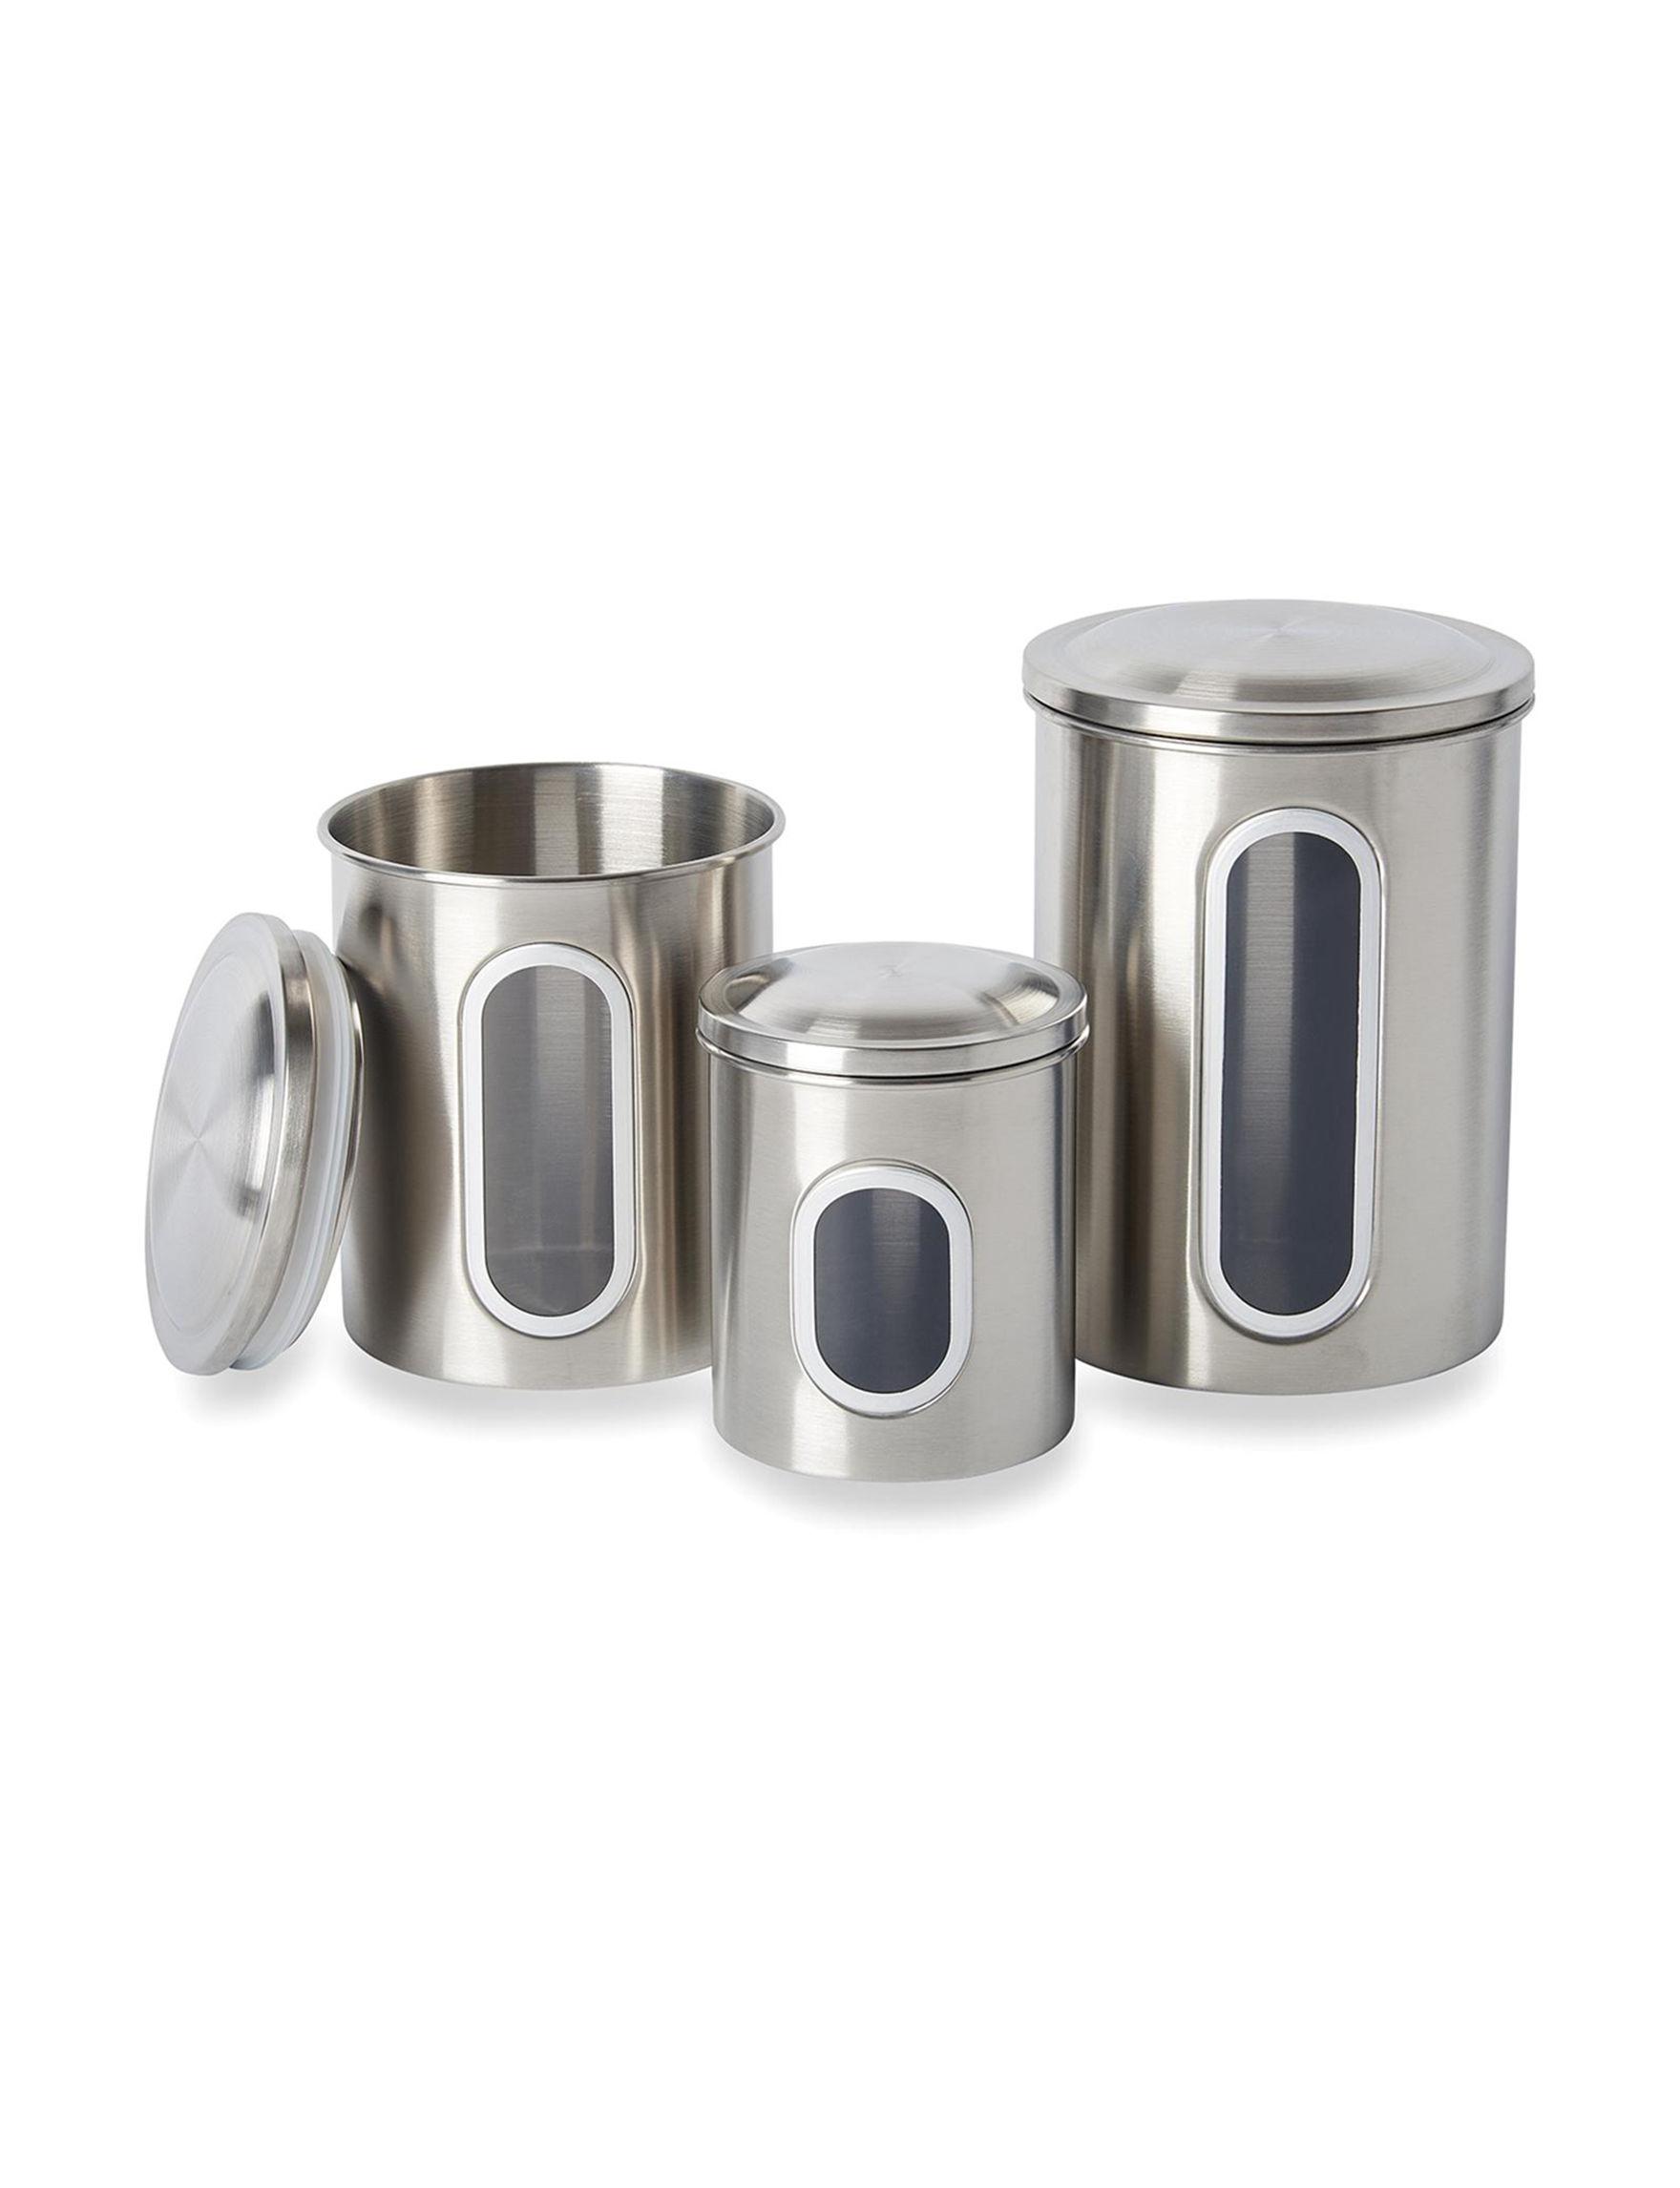 Fox Run Silver Canister Sets Kitchen Storage & Organization Storage & Organization